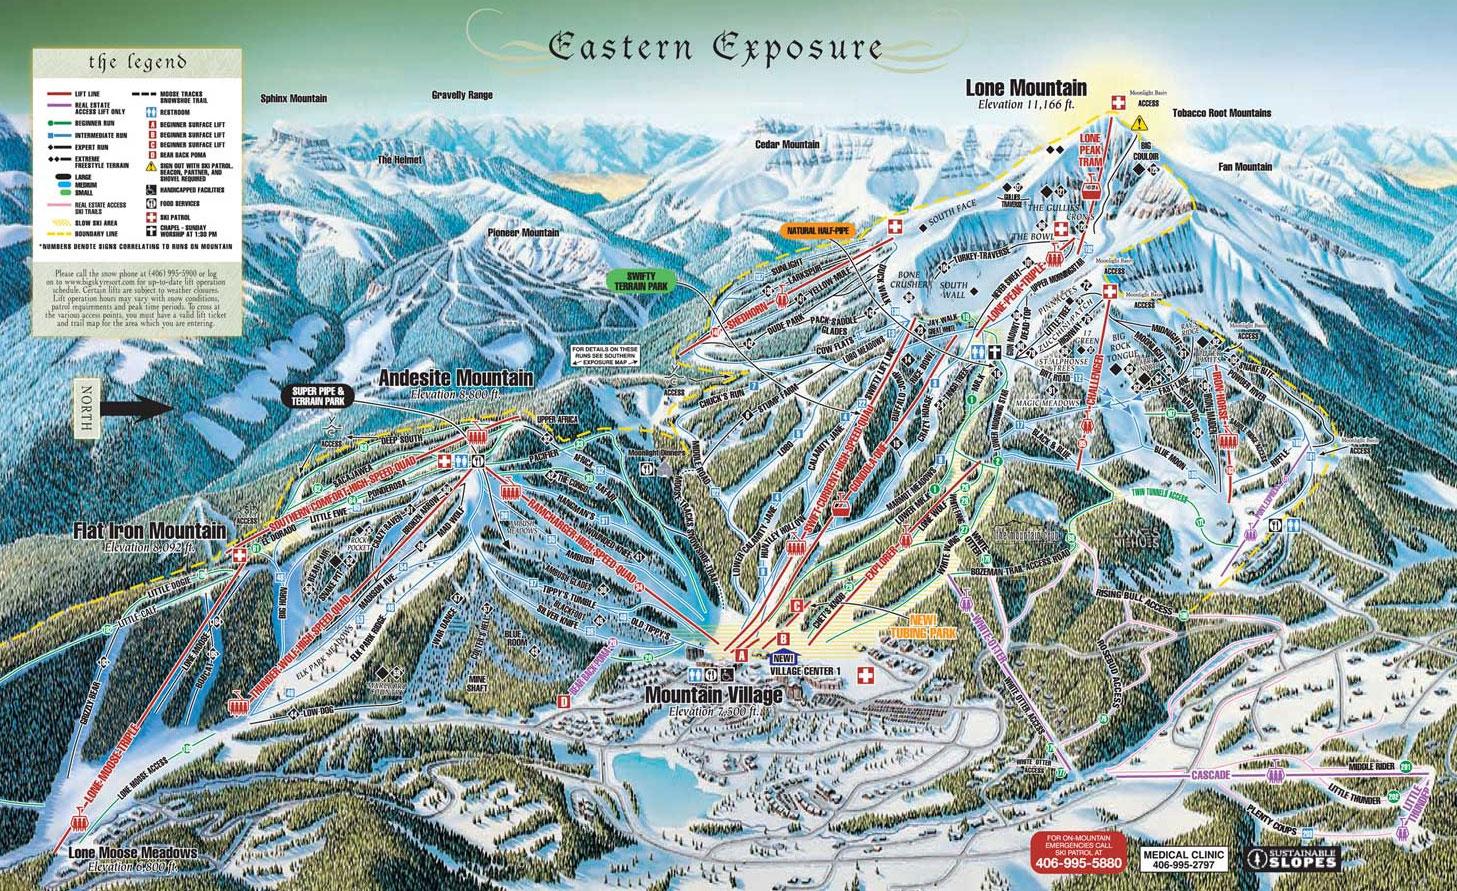 big sky ski resort trail map eastern exposure 2006-07 - big sky mt